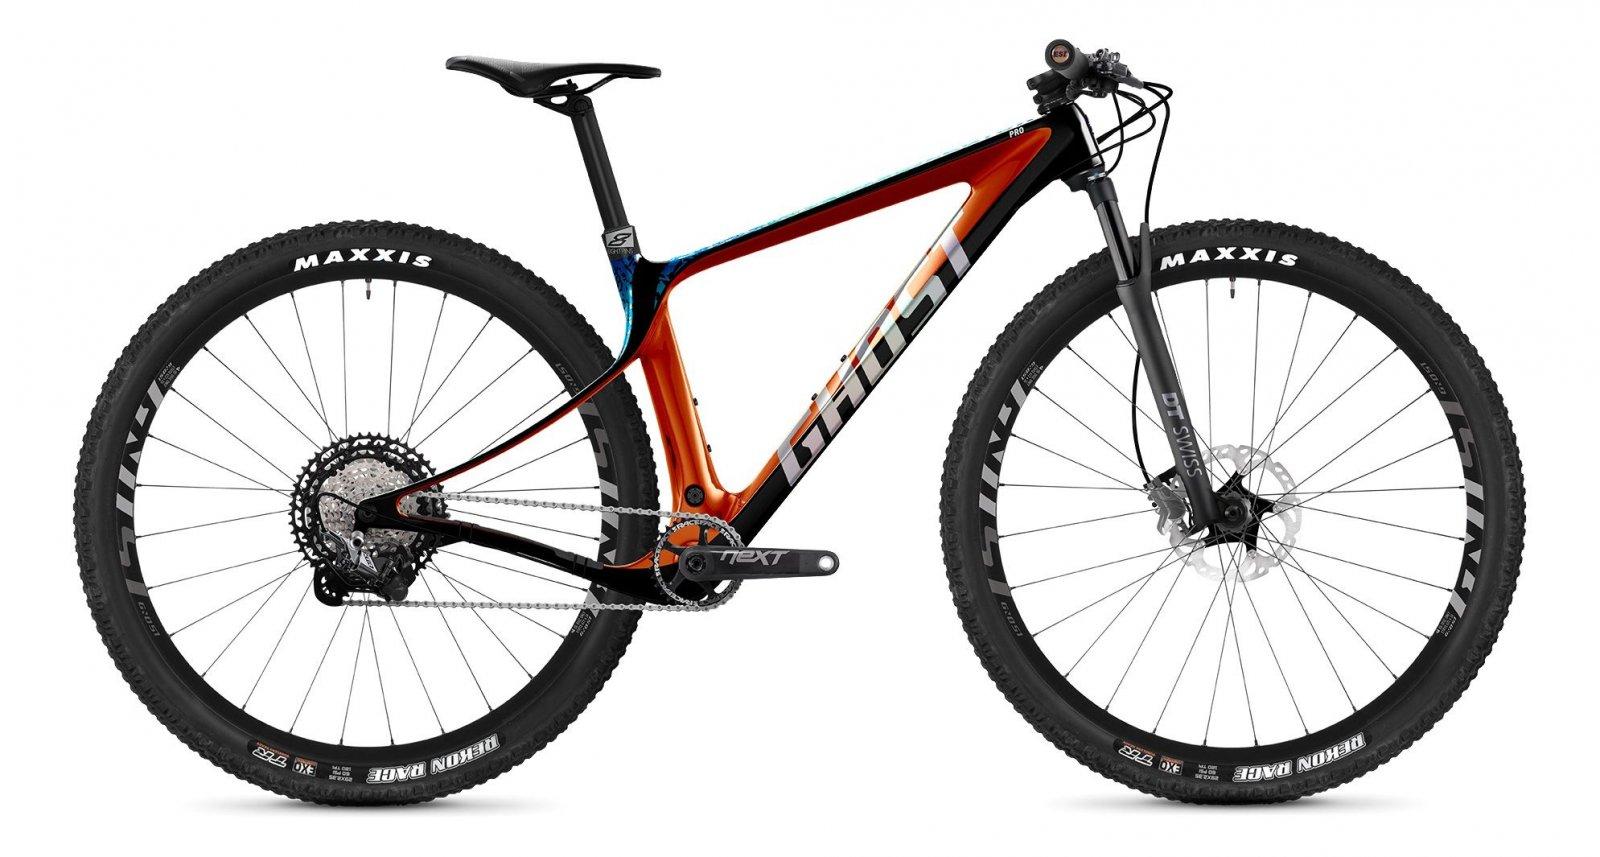 Ghost-lector_sf_uc_pro-_mountain_bike-2021-01.jpg